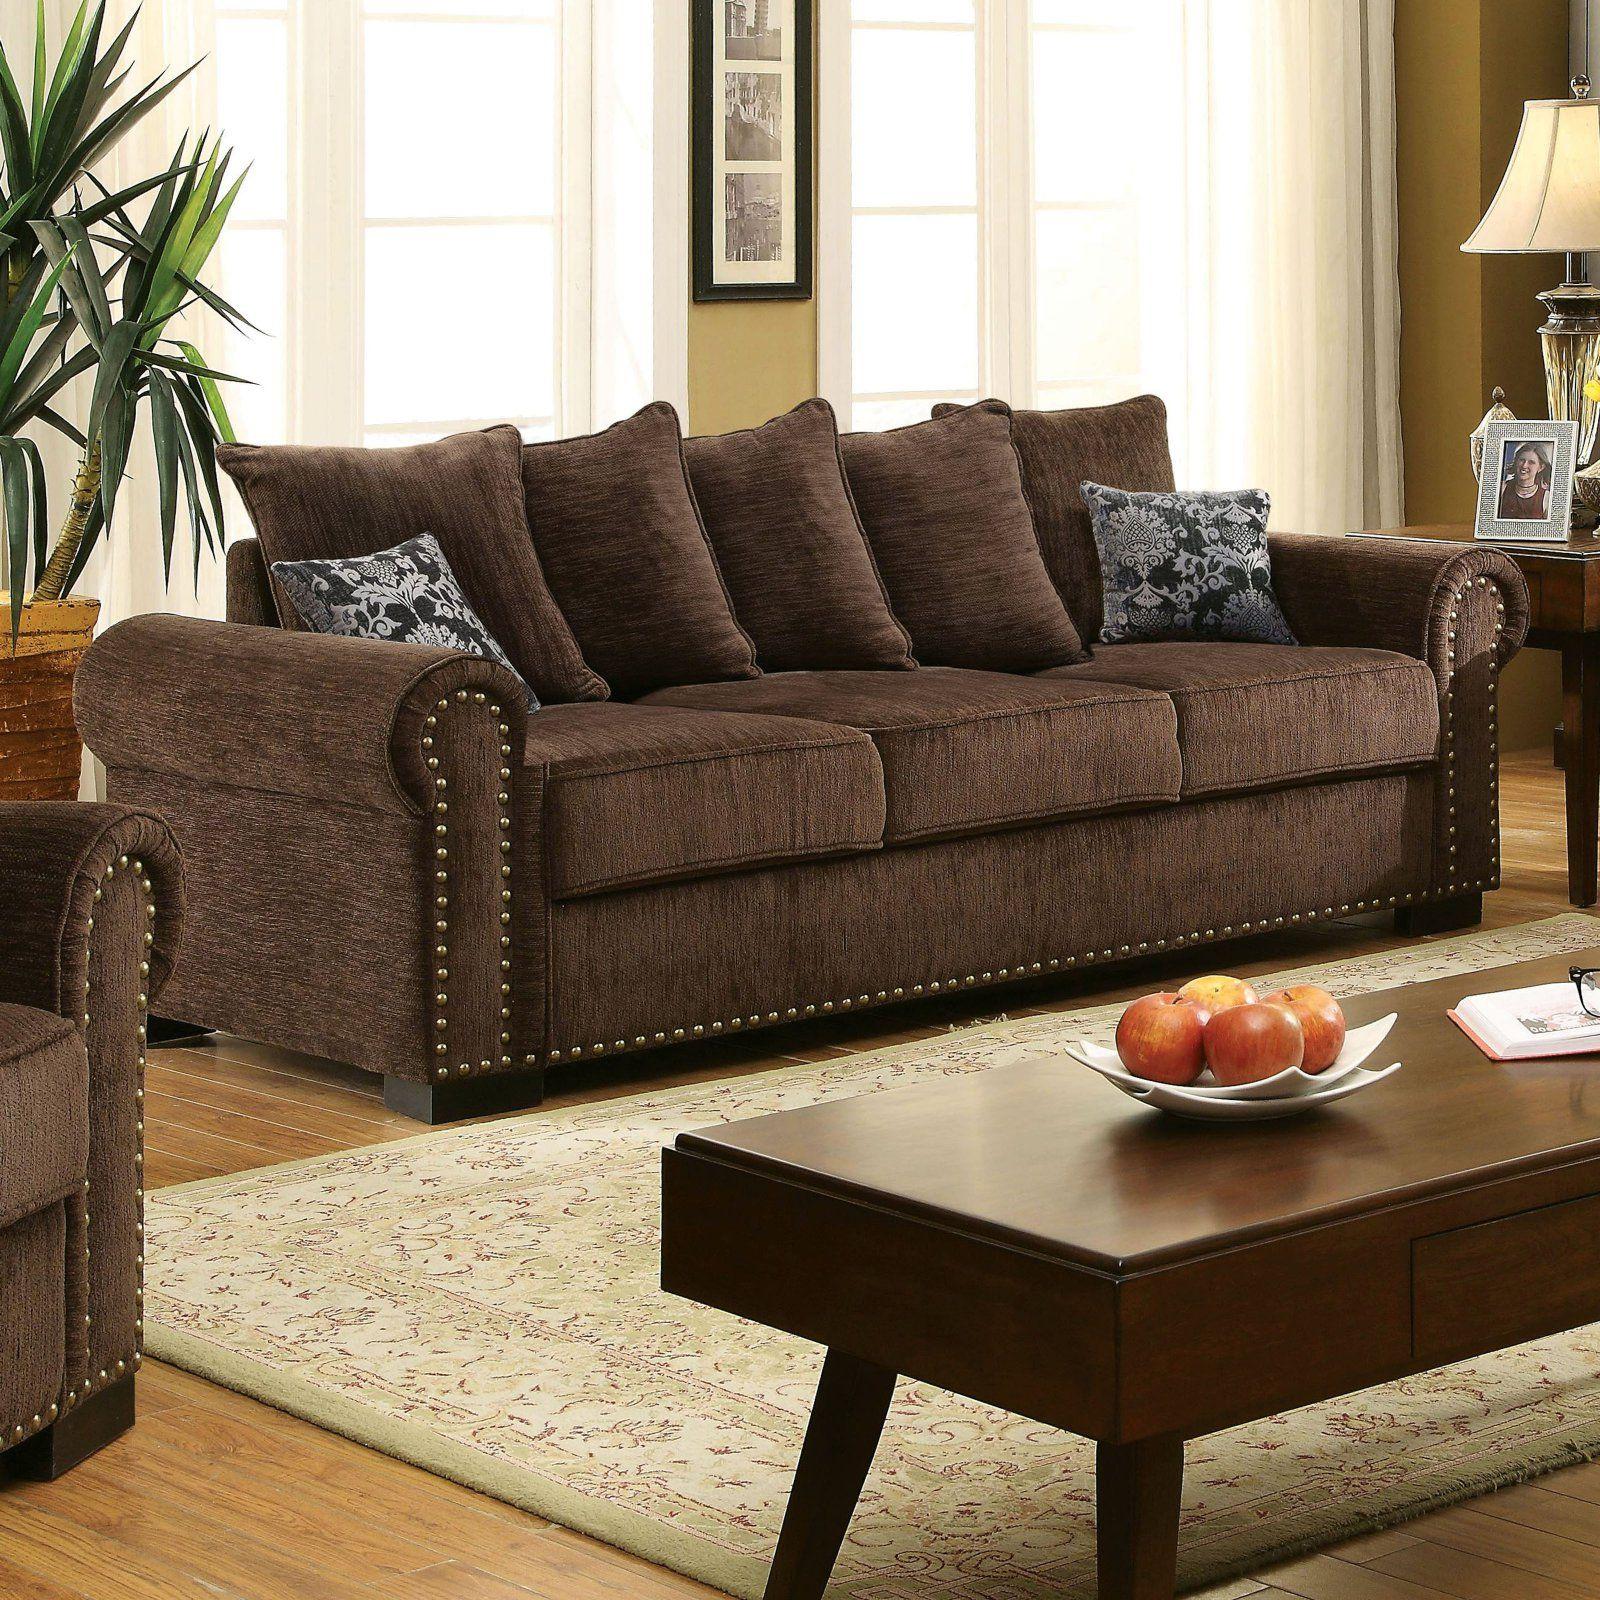 Furniture of America Artesia Sofa with Nailhead Trim ...